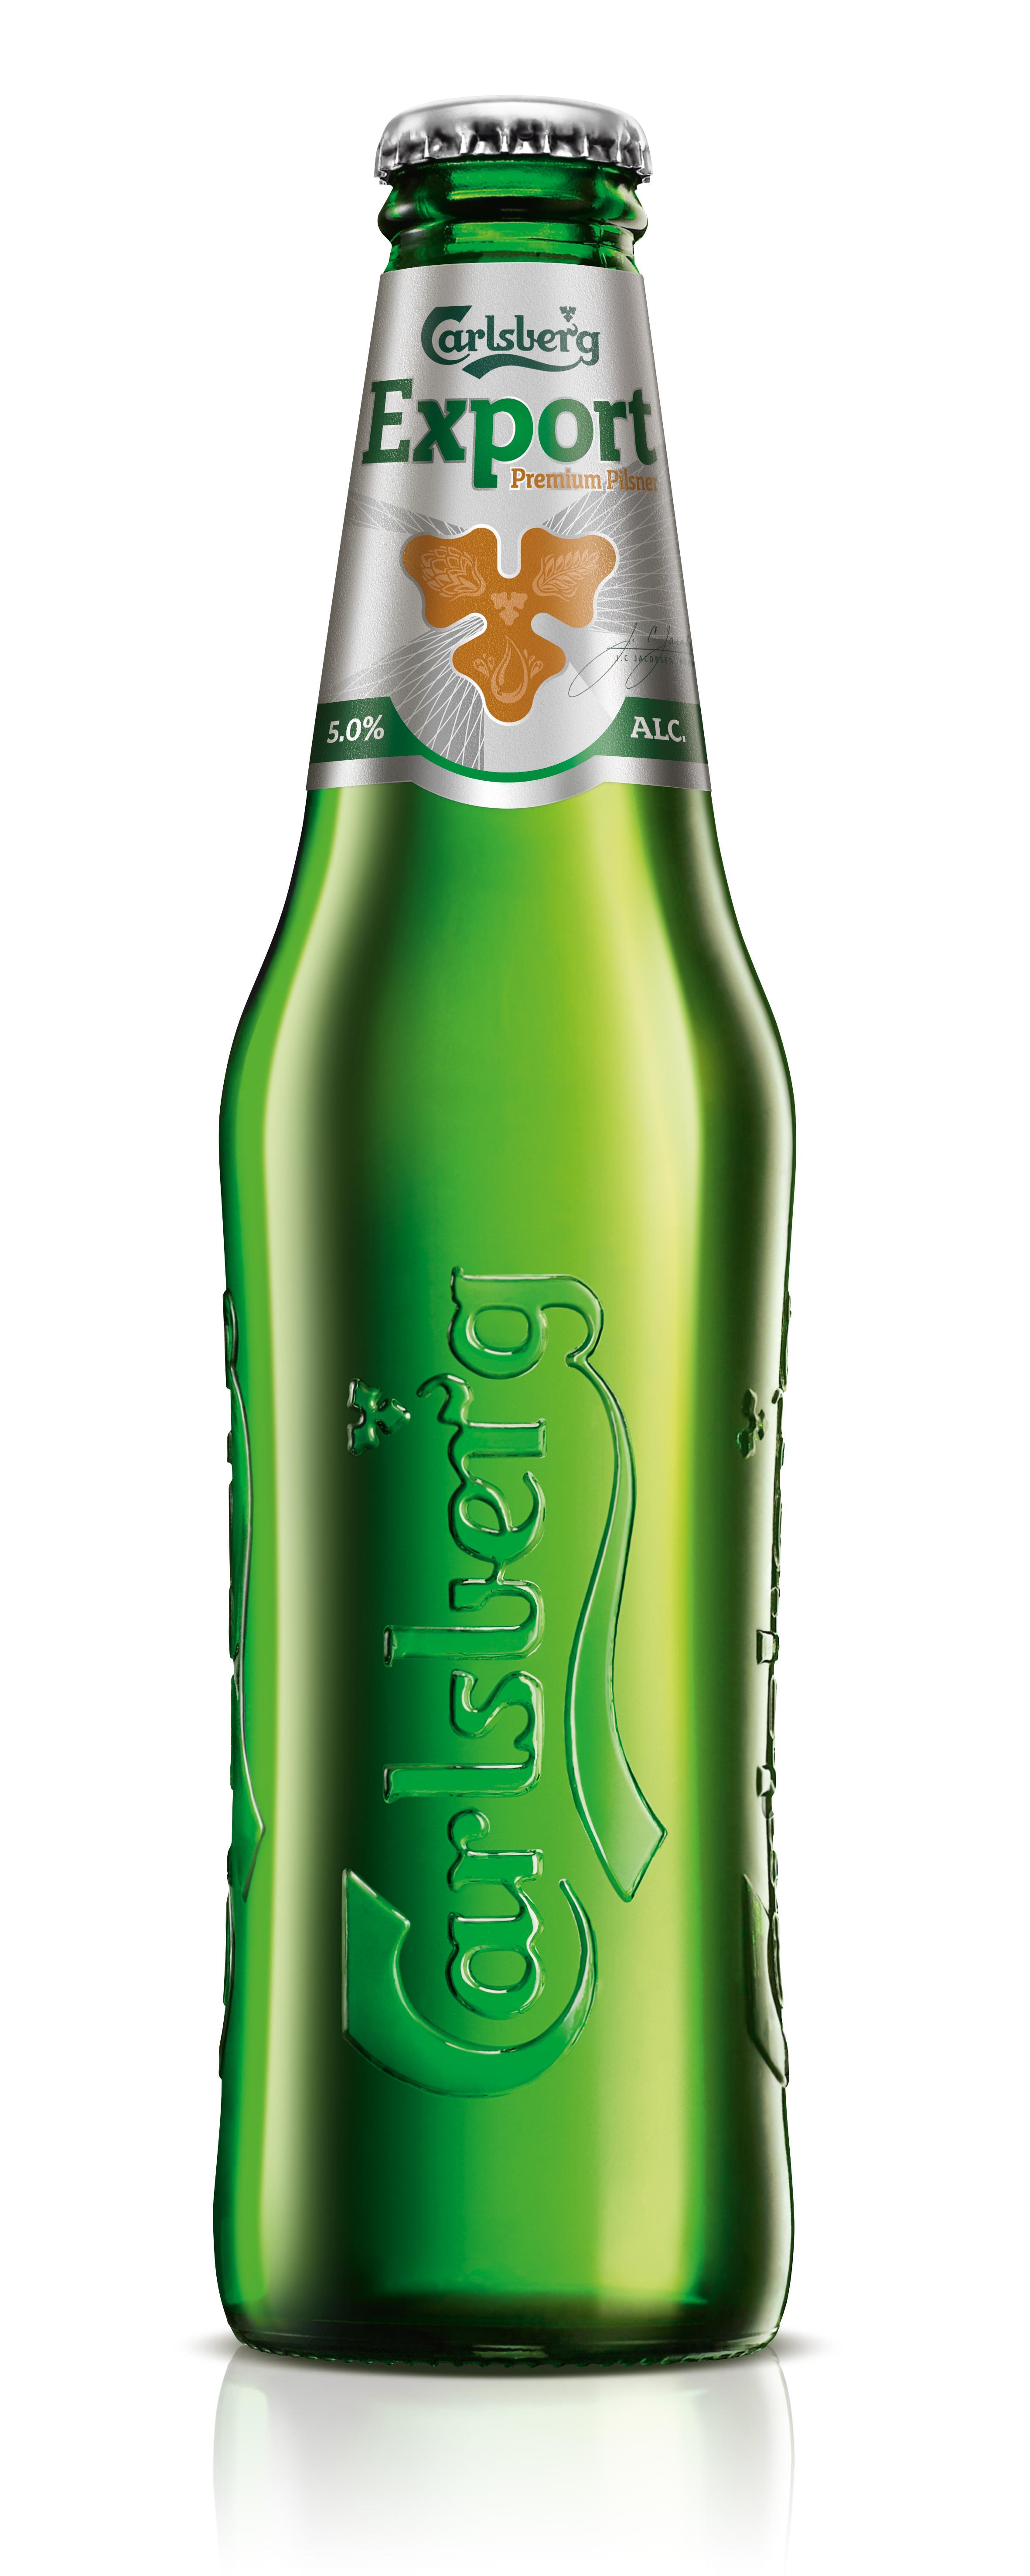 The current branding for Carlsberg Export